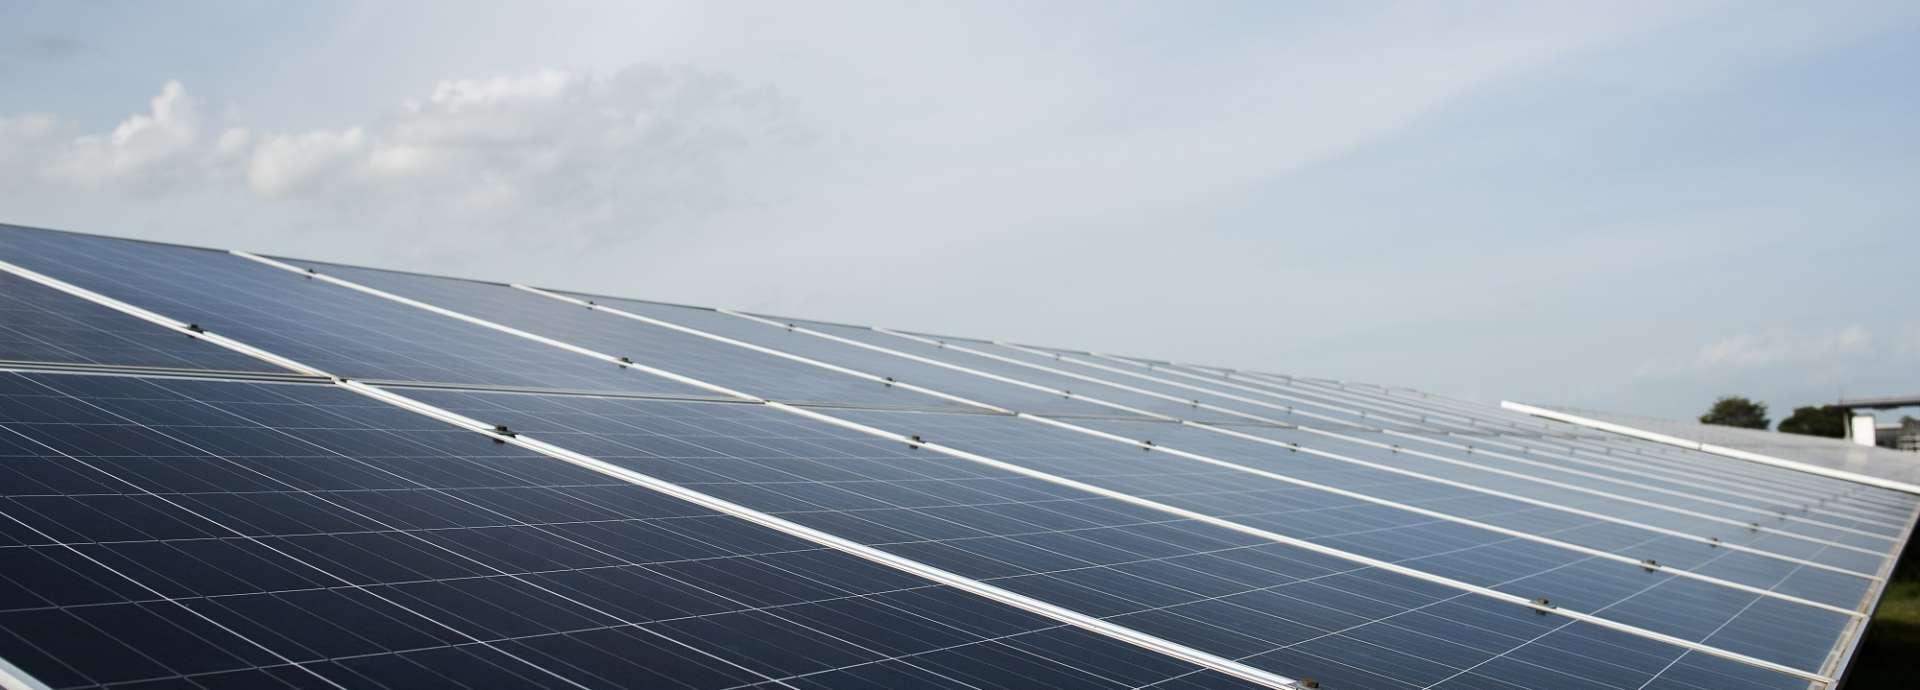 aide-installation-panneaux-solaires-geneve-3